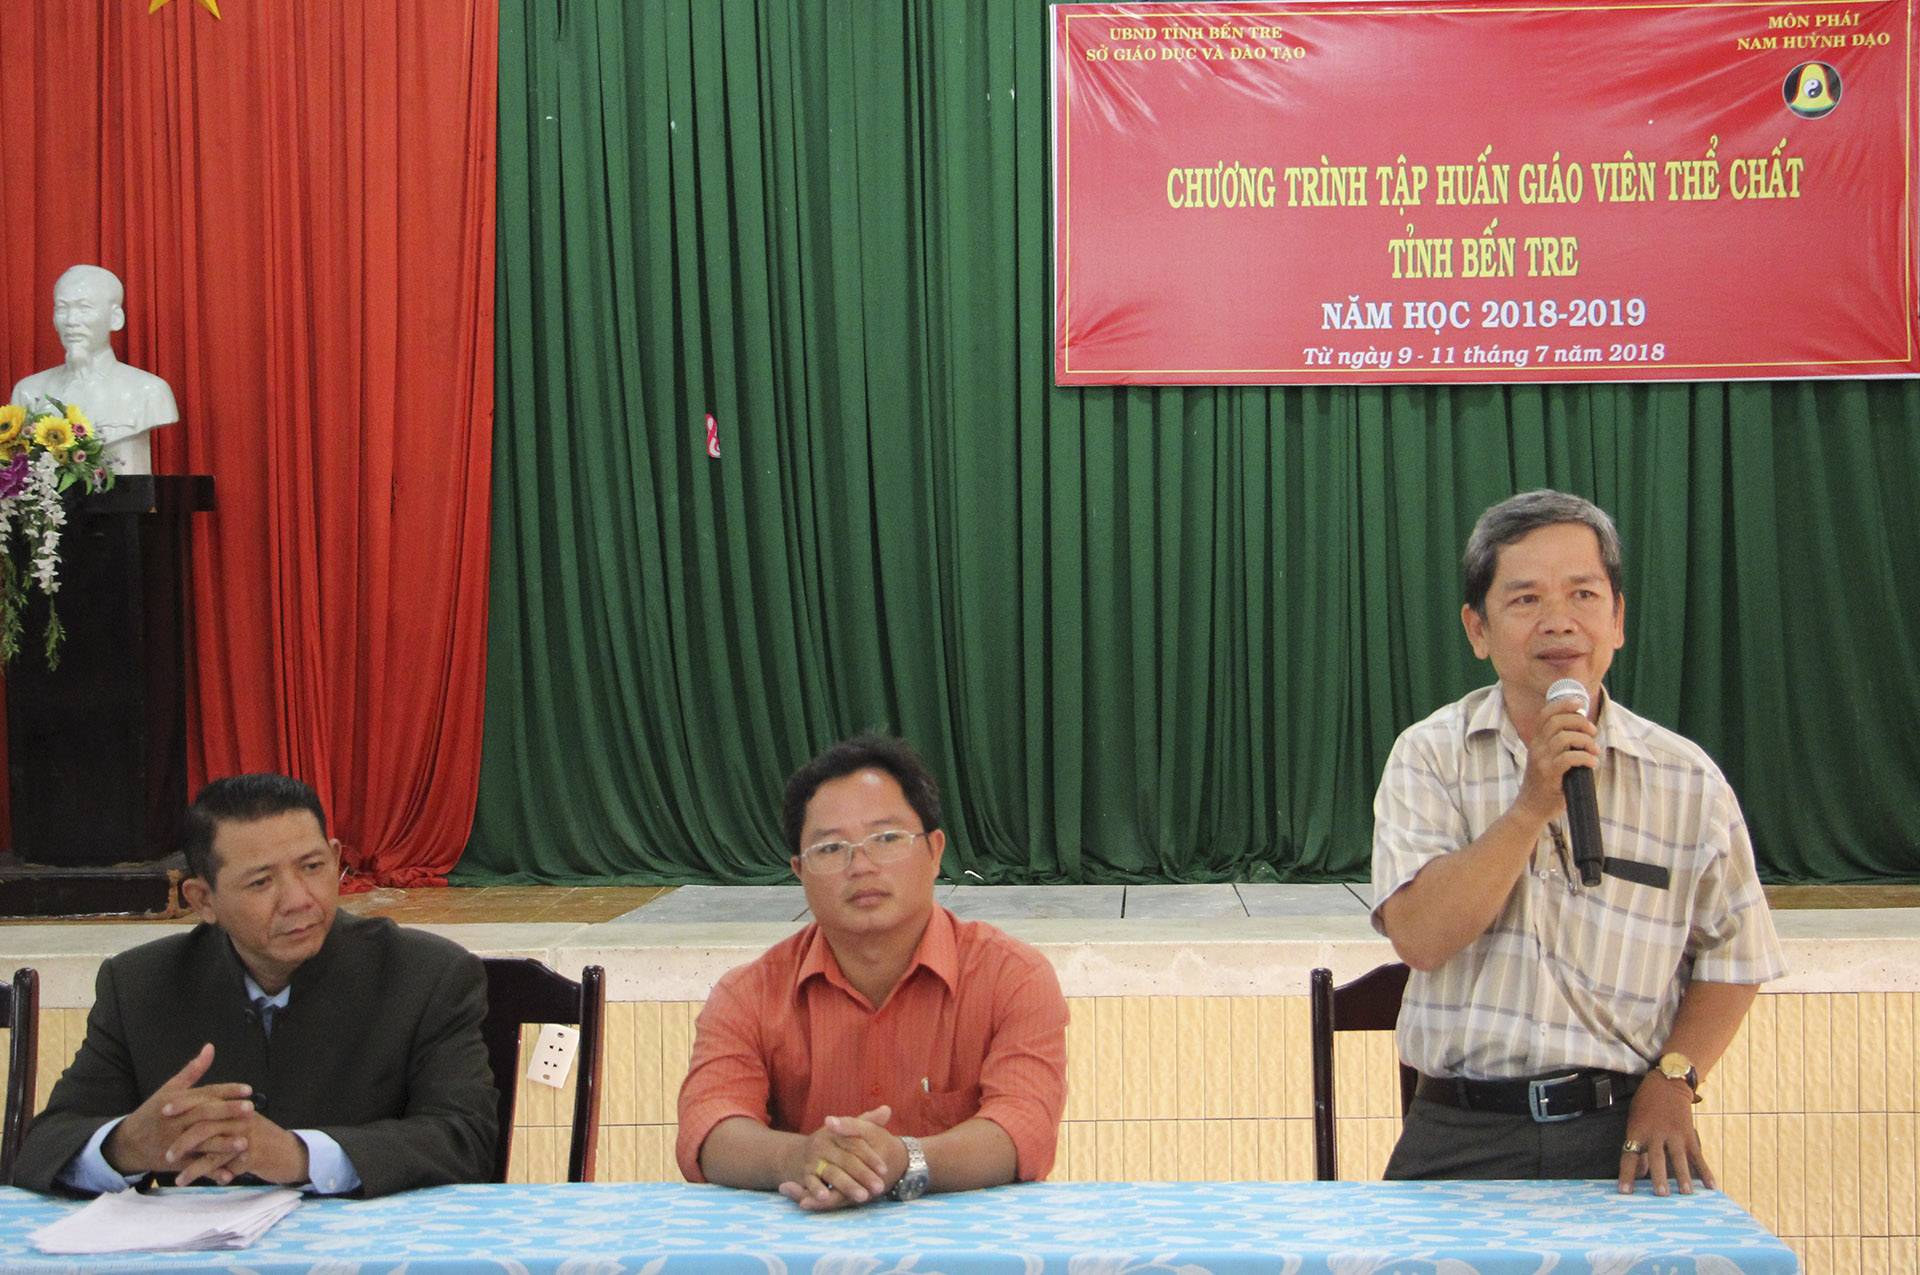 Chuong-trinh-pho-cap-vo-dan-toc-nam-huynh-dao-tai-ben-tre 03